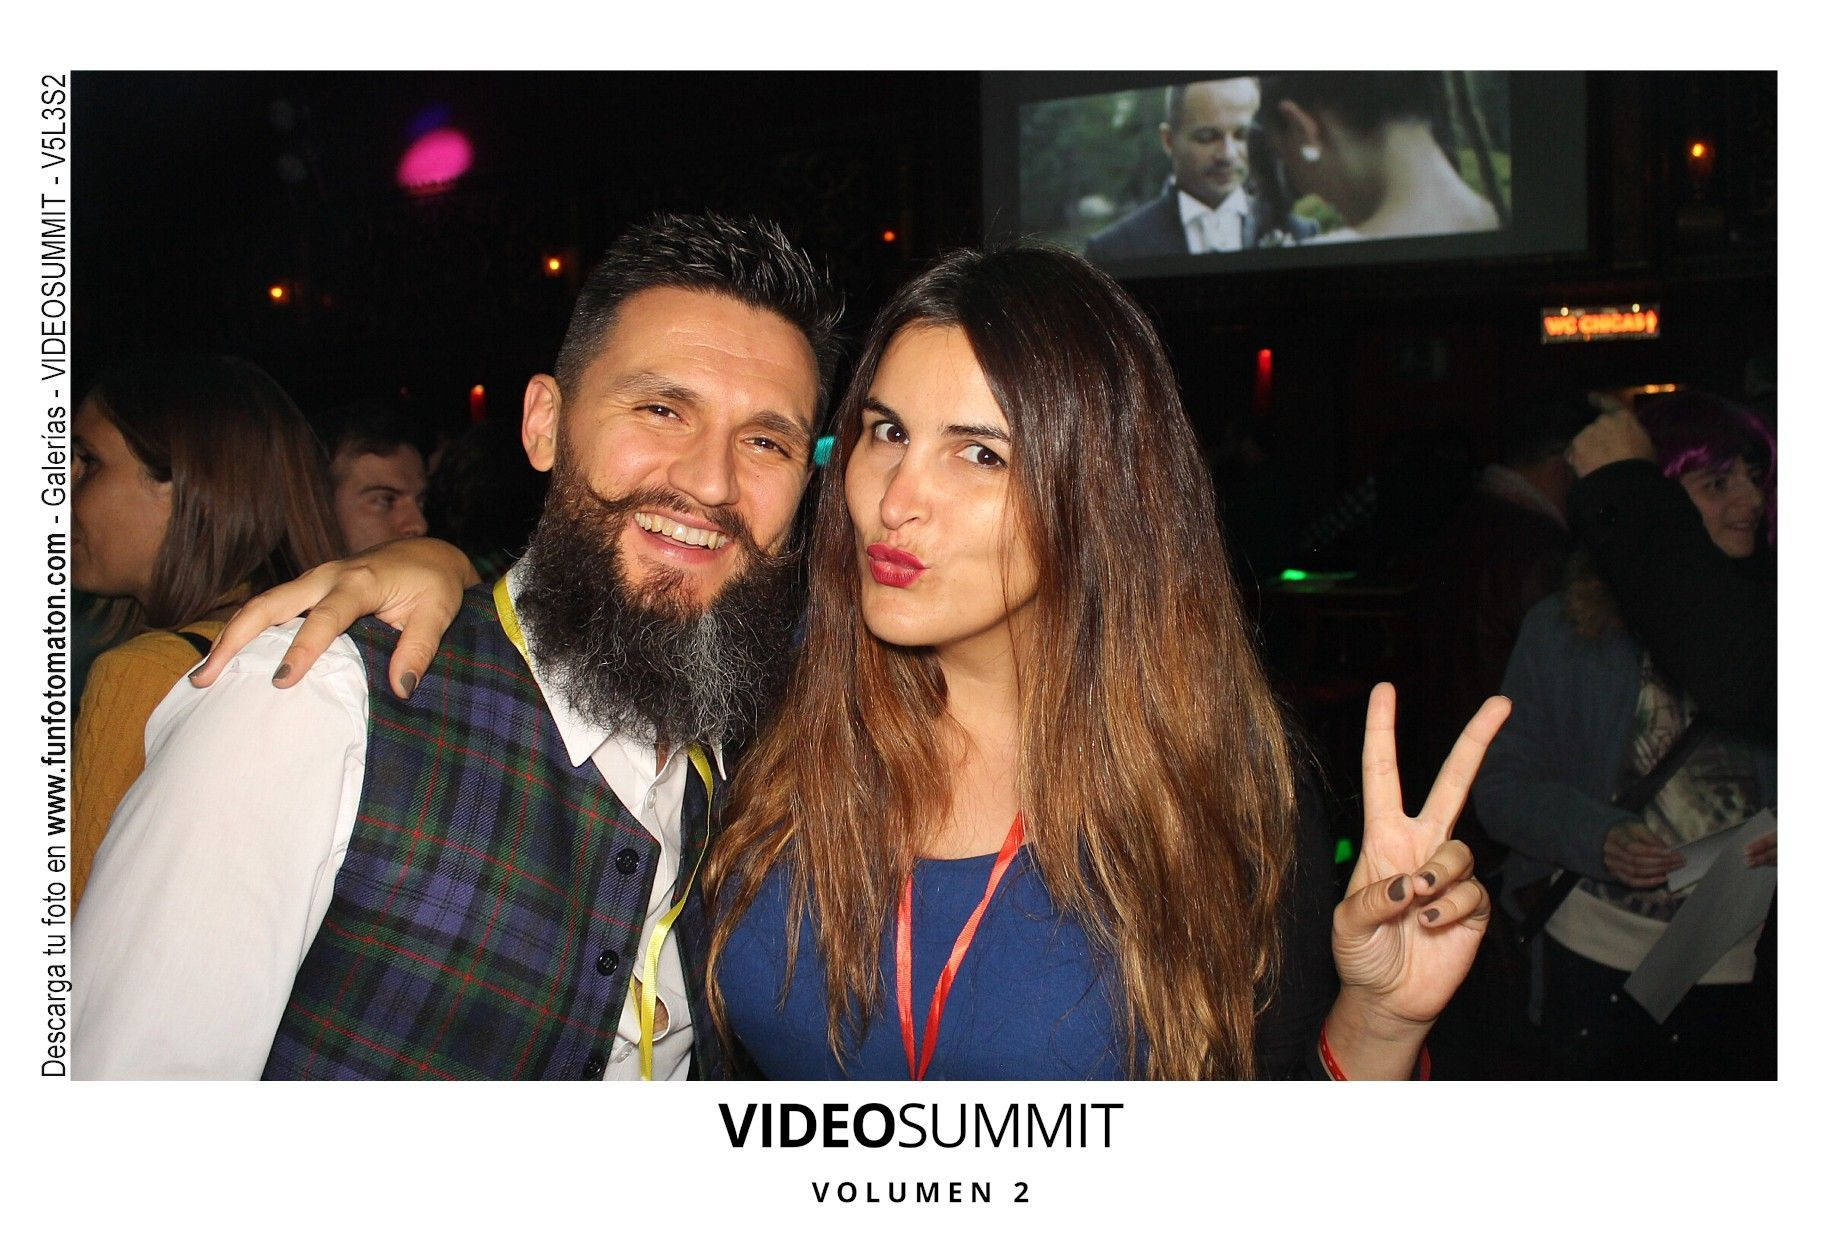 videosummit-vol2-club-party-017